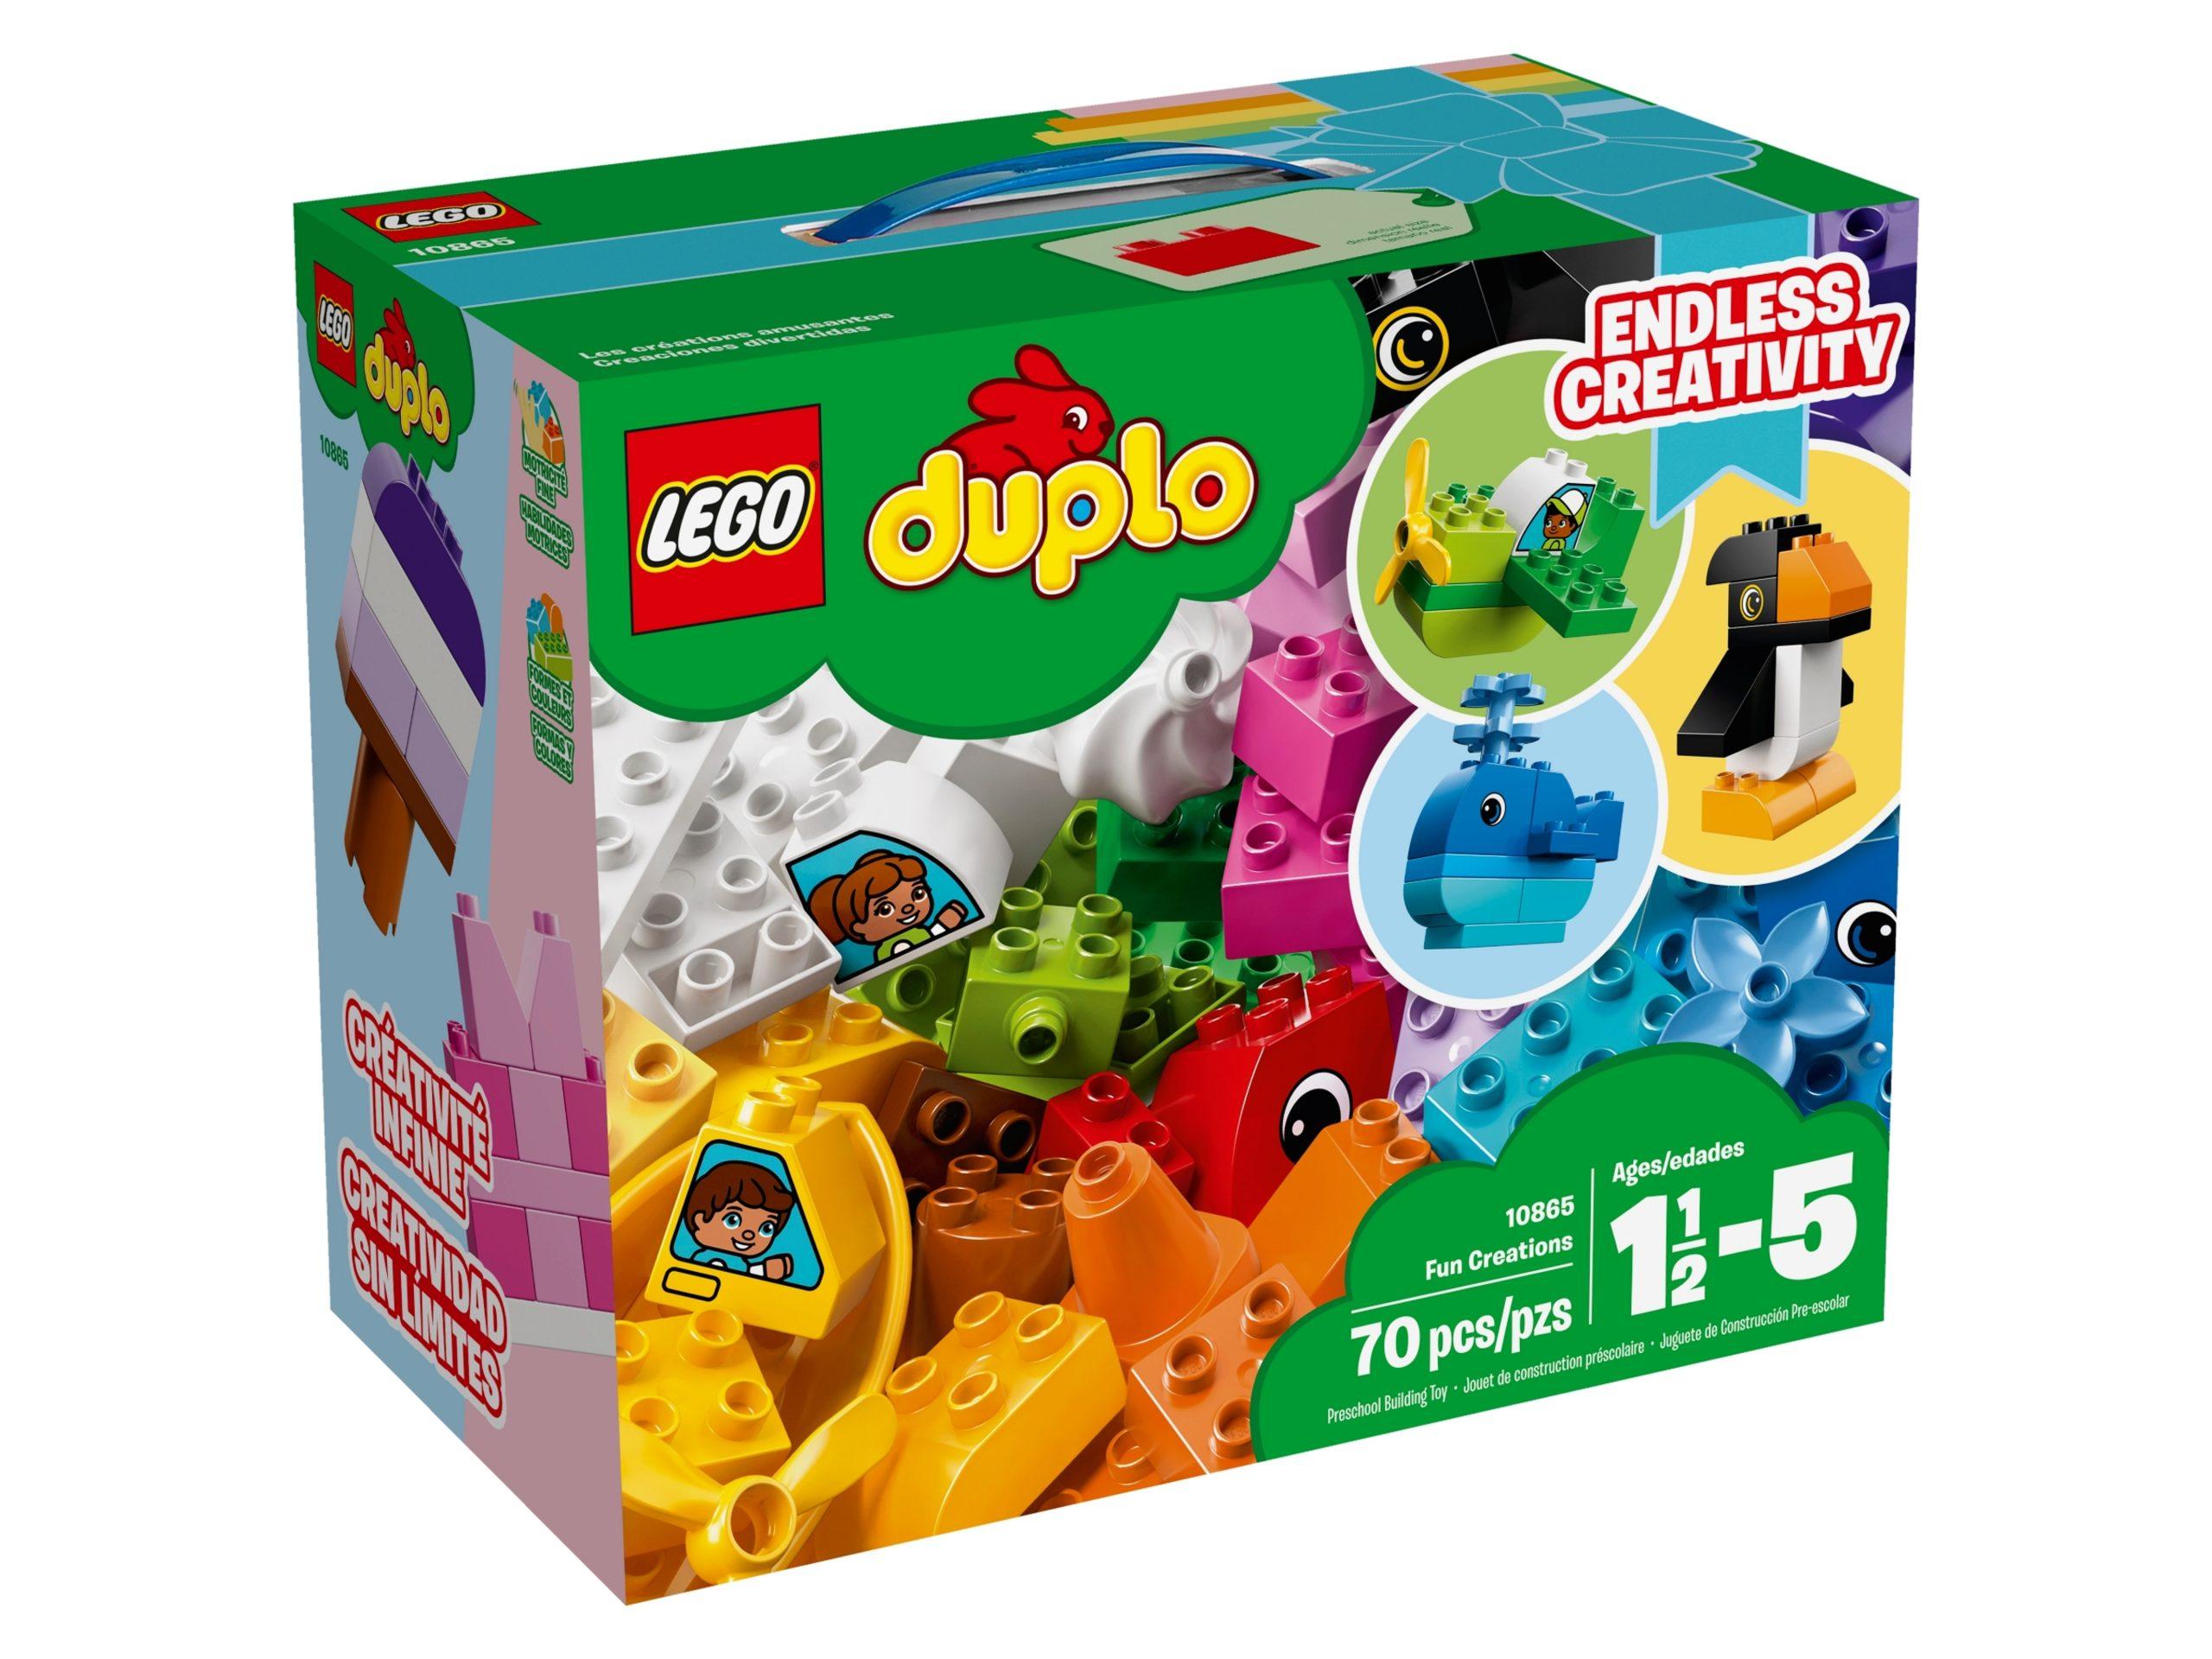 lego 10865 fun creations scaled